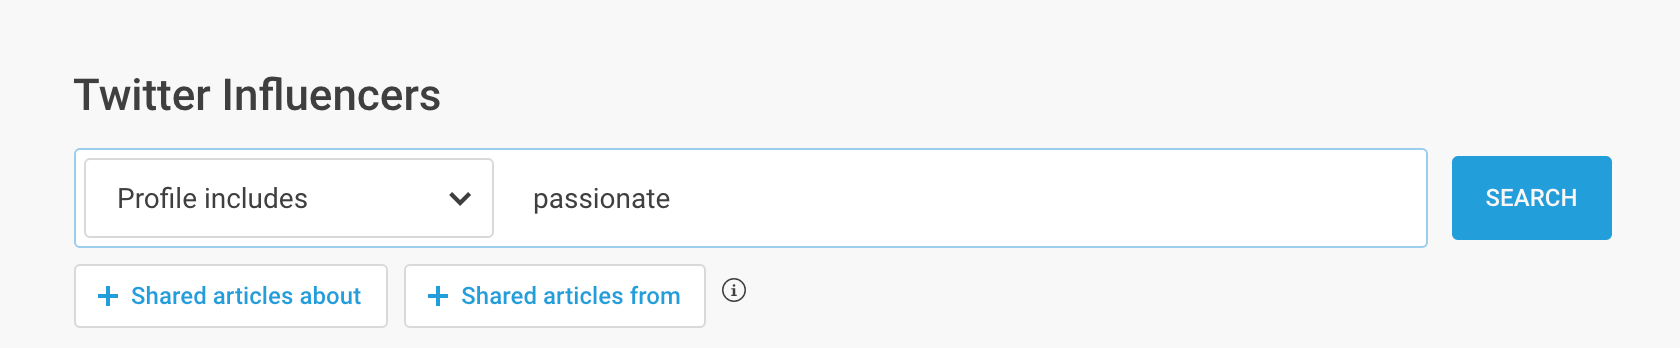 twitter profile search in buzzsumo